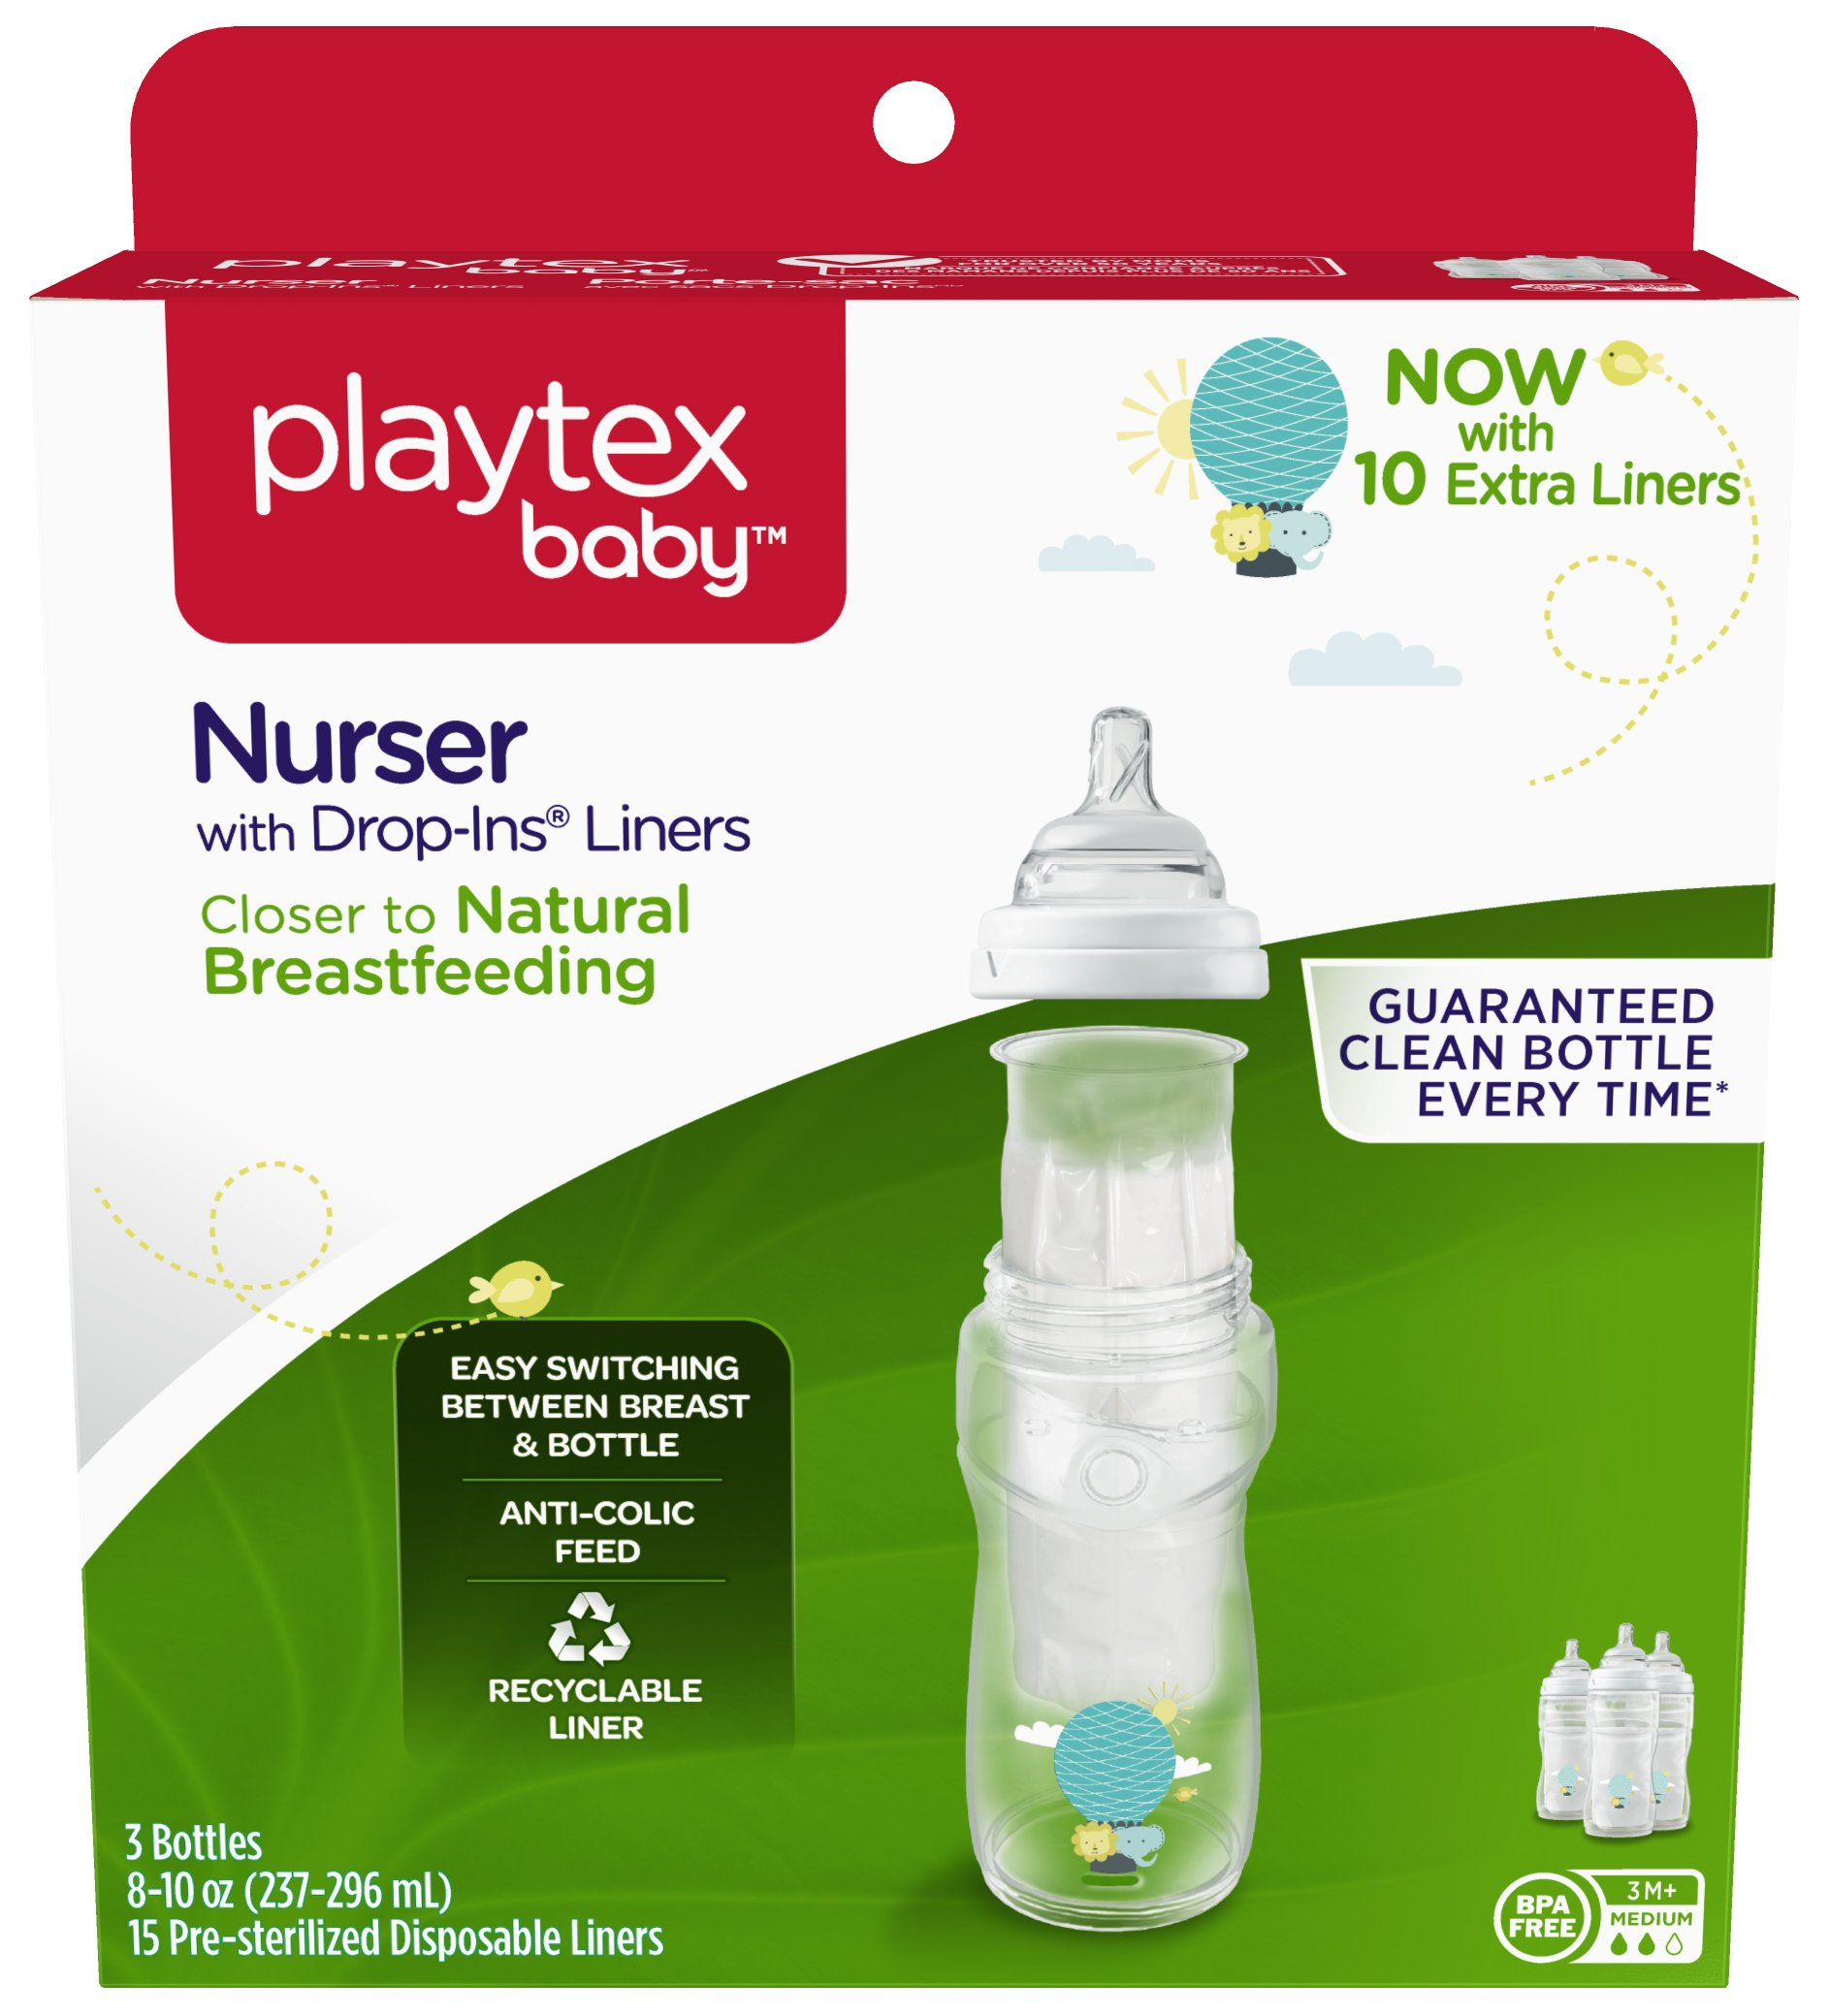 Baby Bottles Cheap Price Playtex 4oz Disposable Bottles Pre Sterilized 50 Bottles Per Box Lot Of 3 Boxes Bottle Feeding